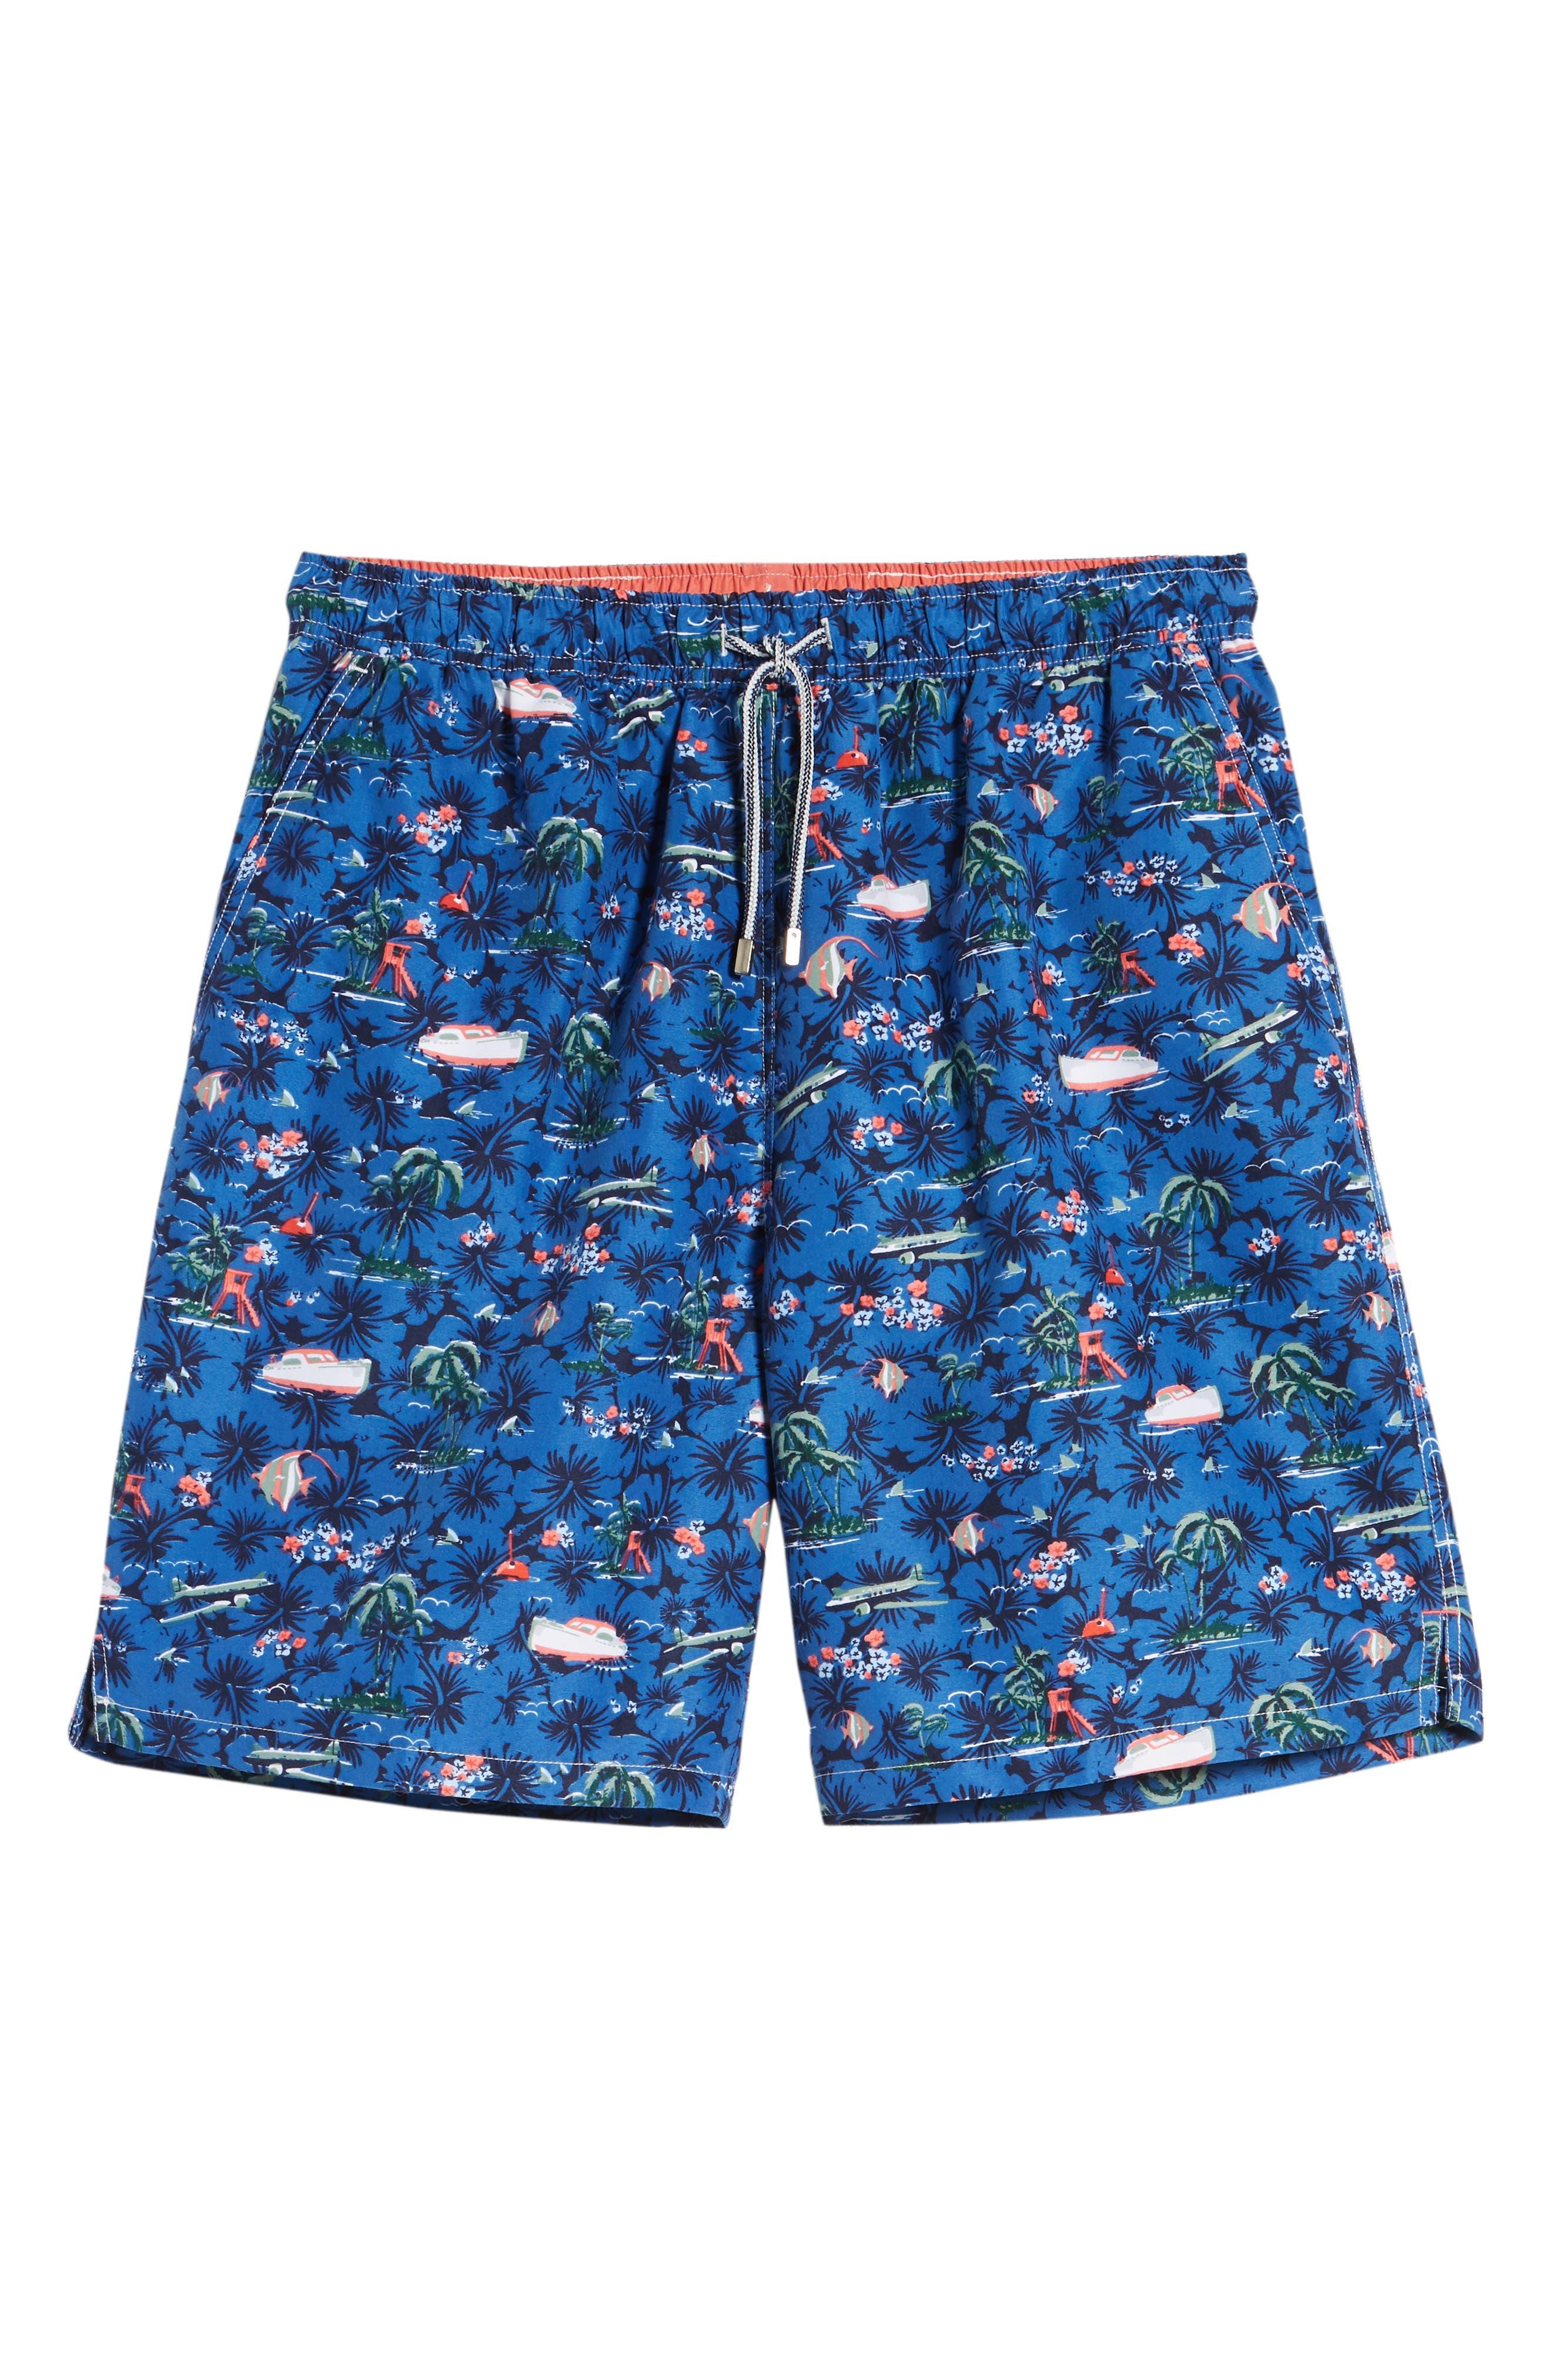 Hawaiian Express Swim Trunks,                             Alternate thumbnail 6, color,                             BLUE